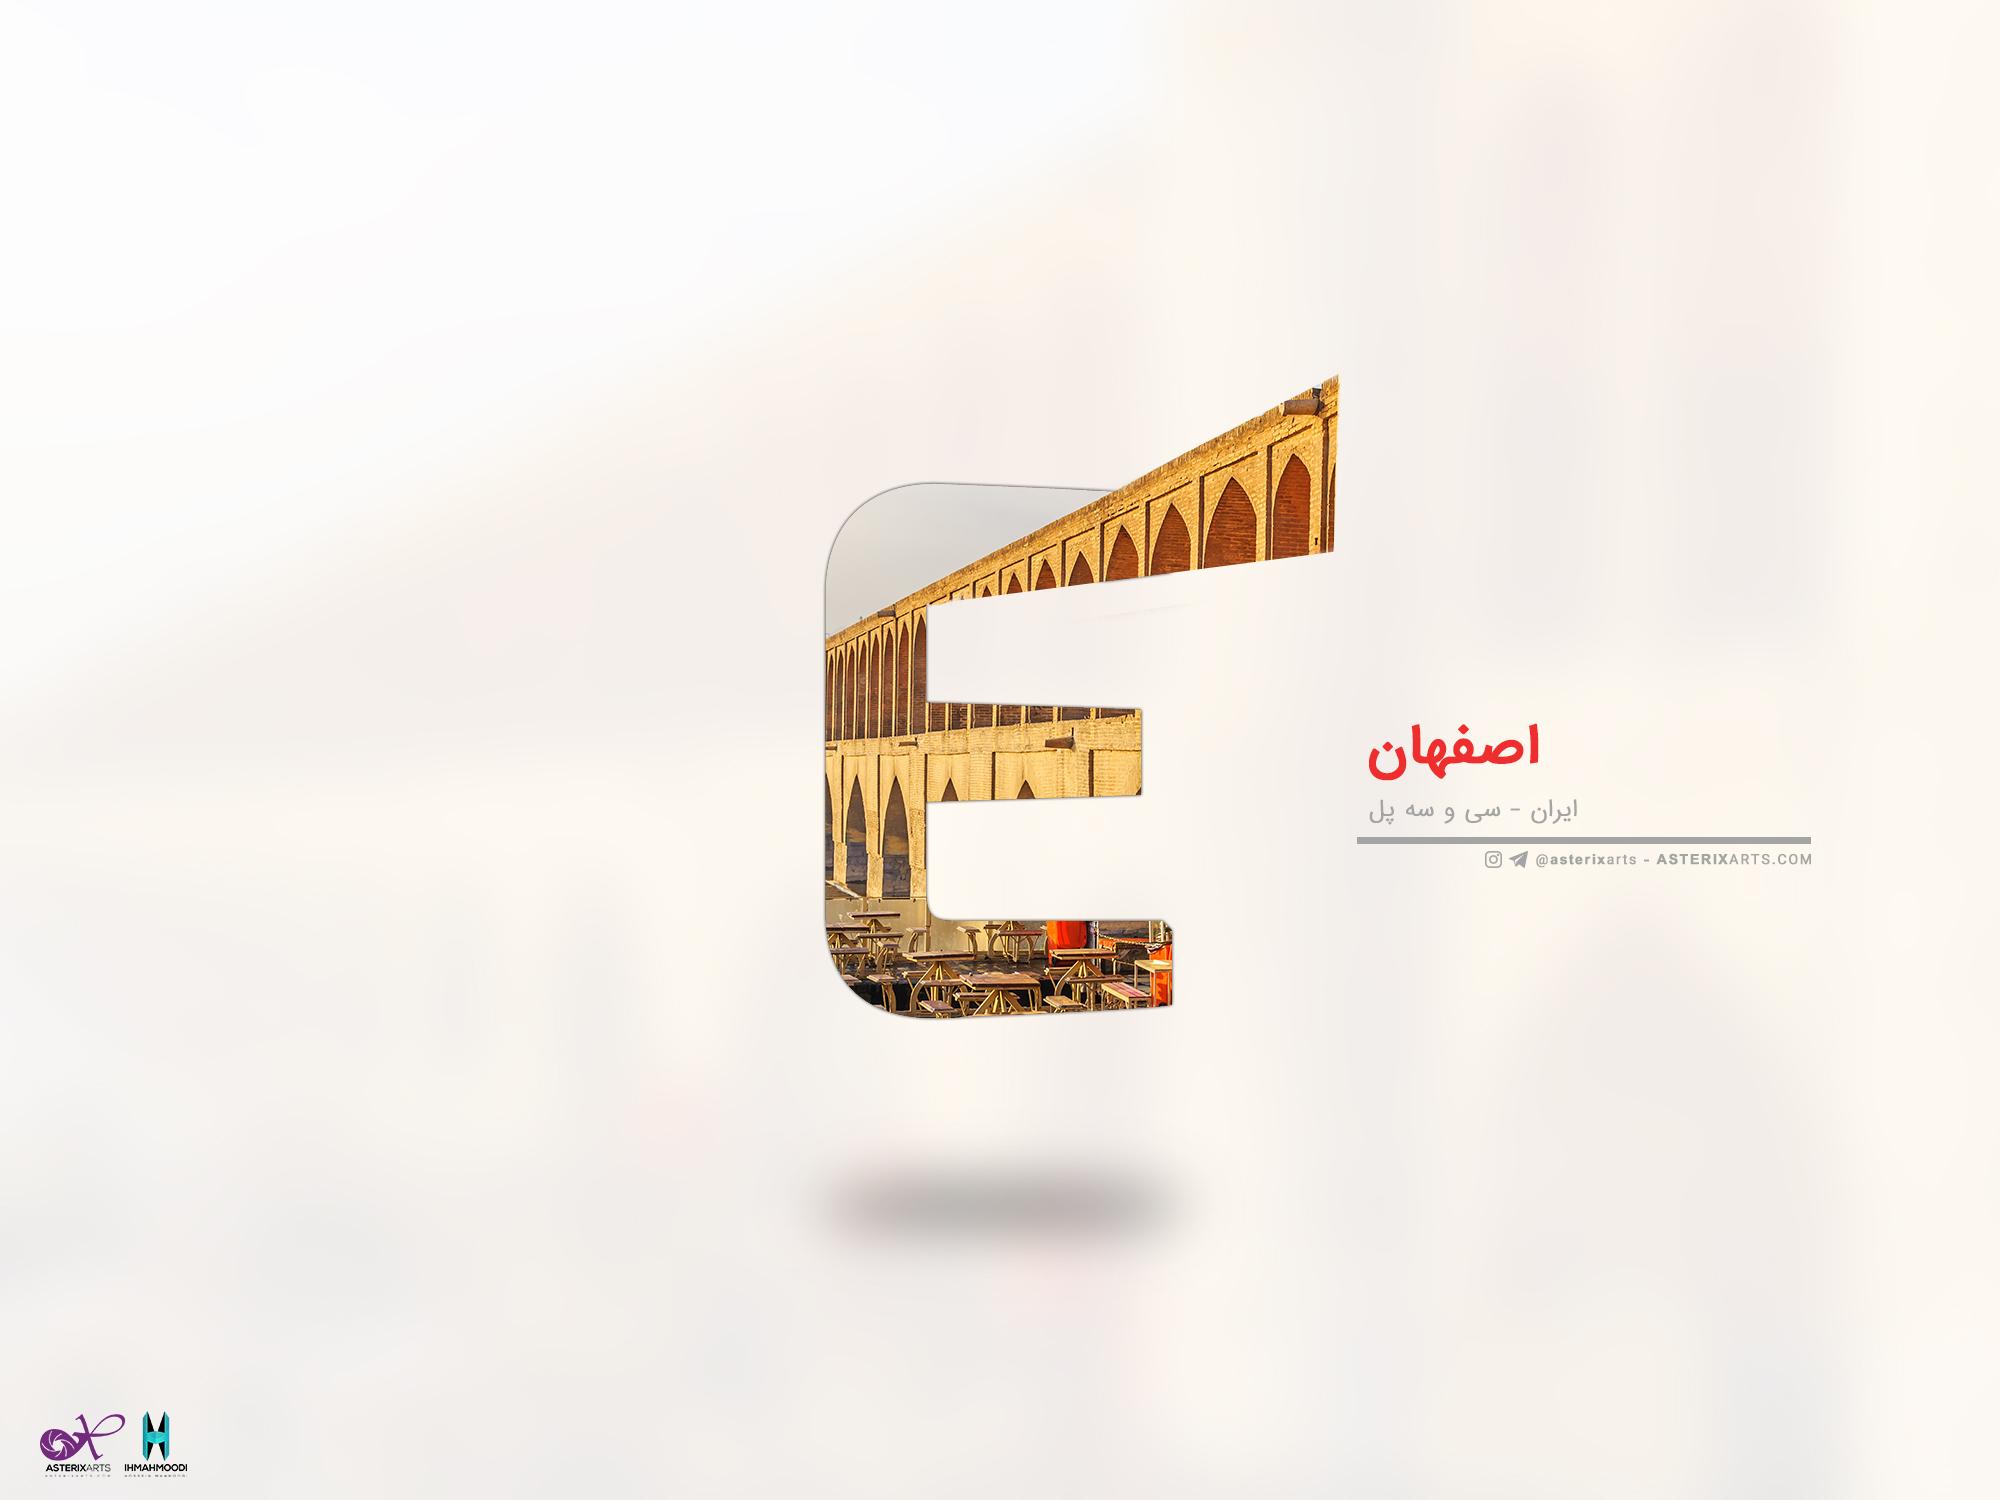 Esfahan - Iram - Si-o-se-pol